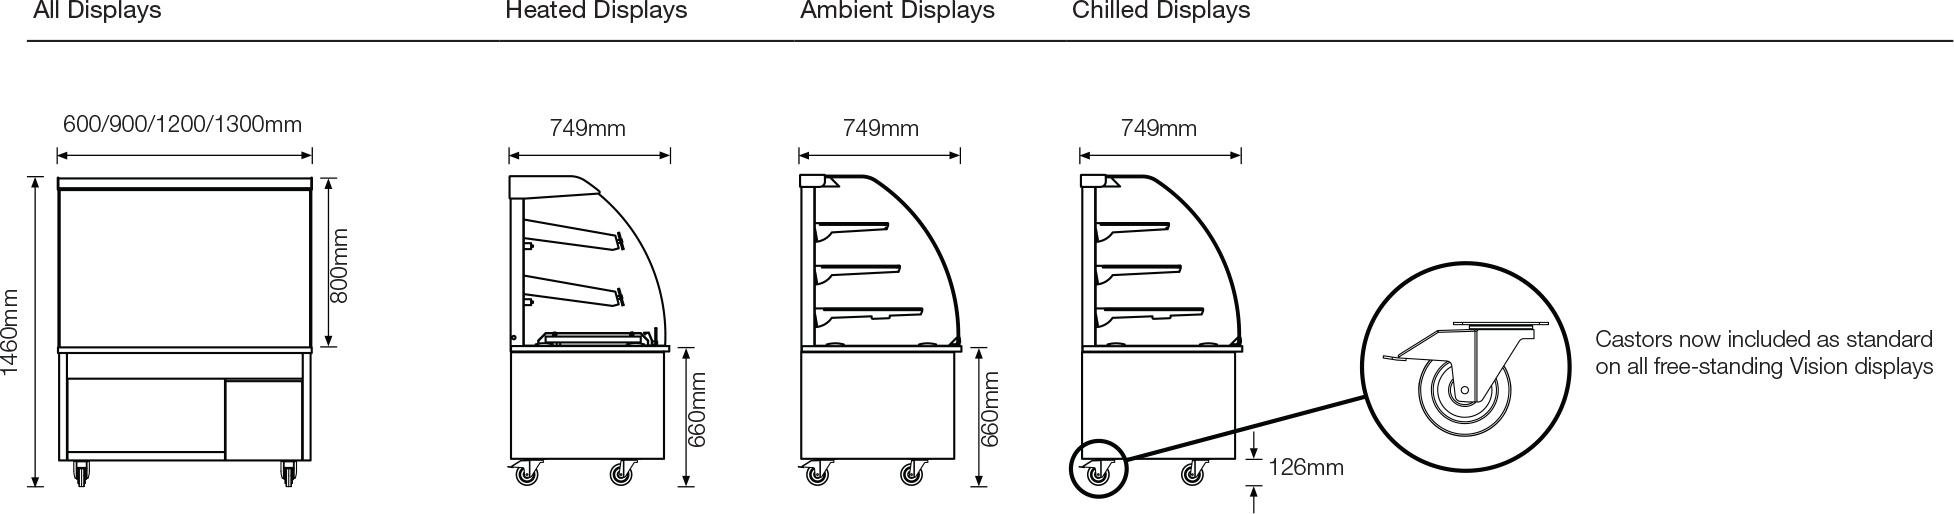 vision-free-standing-displays